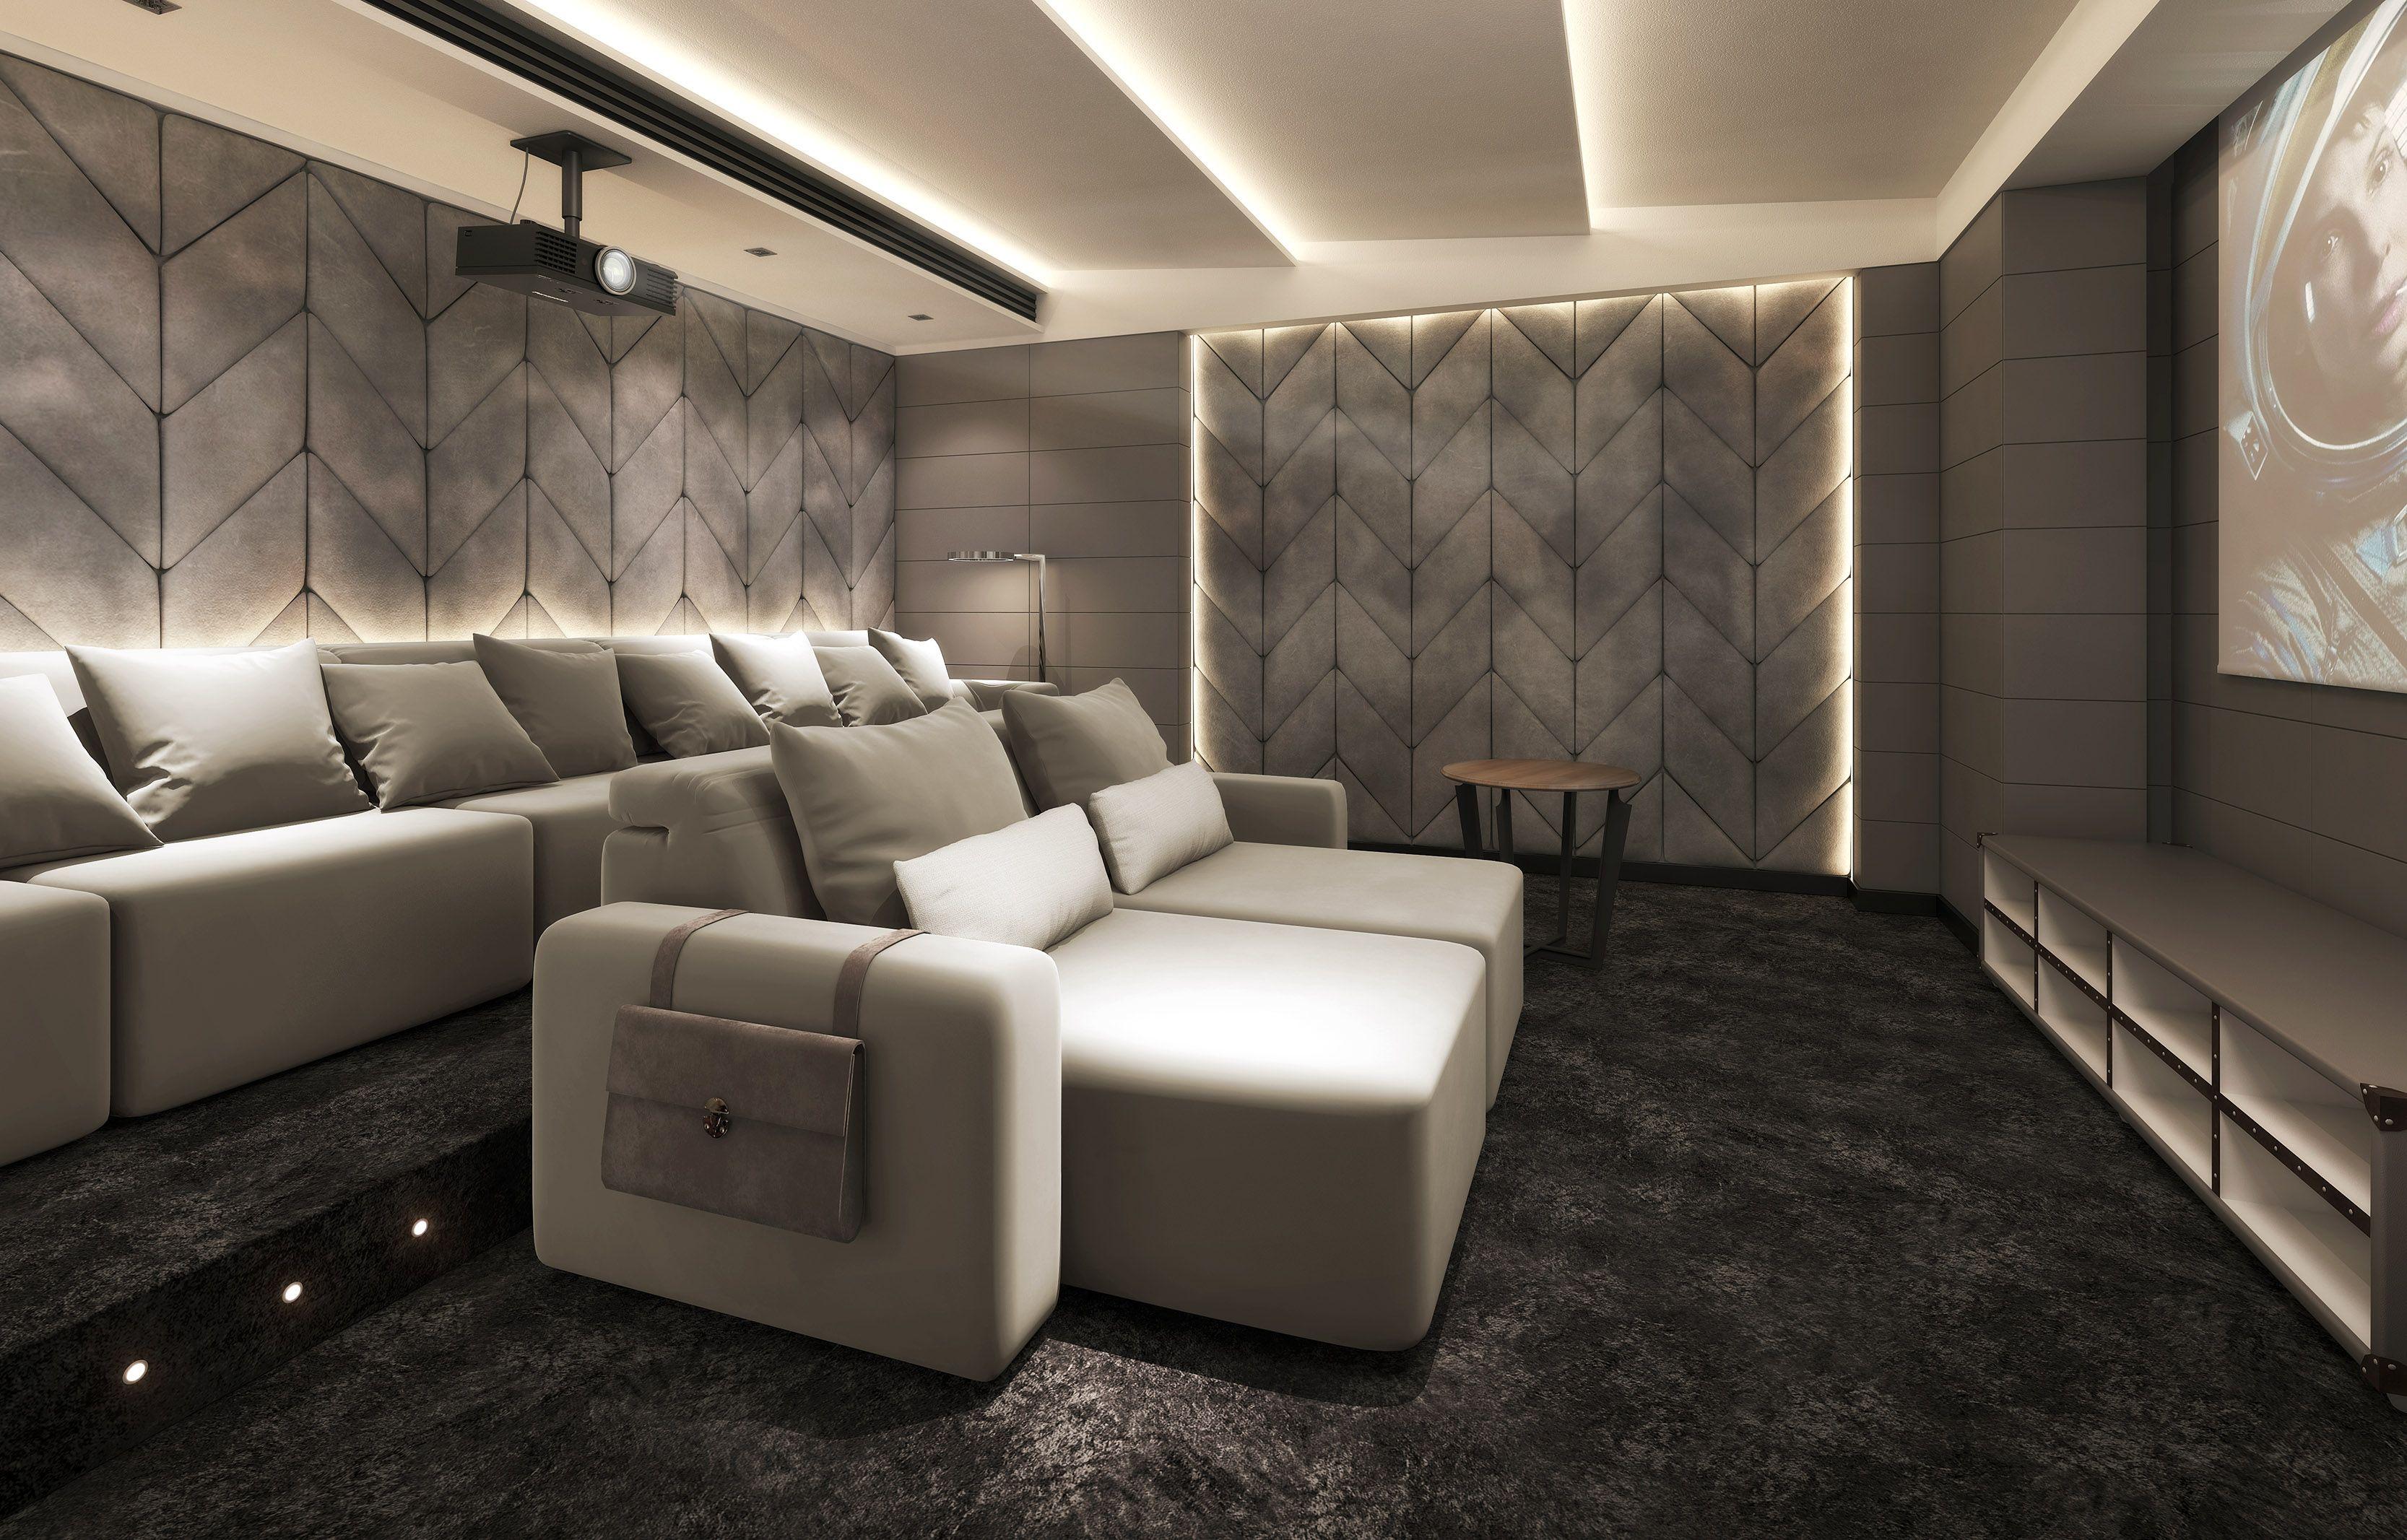 Luxury Home Cinema Room Home Cinema Ideas Home Cinema Seating Home Cinema Sofa Home Cinema Chairs Home Cinema Room Home Cinema Seating Home Theater Seating